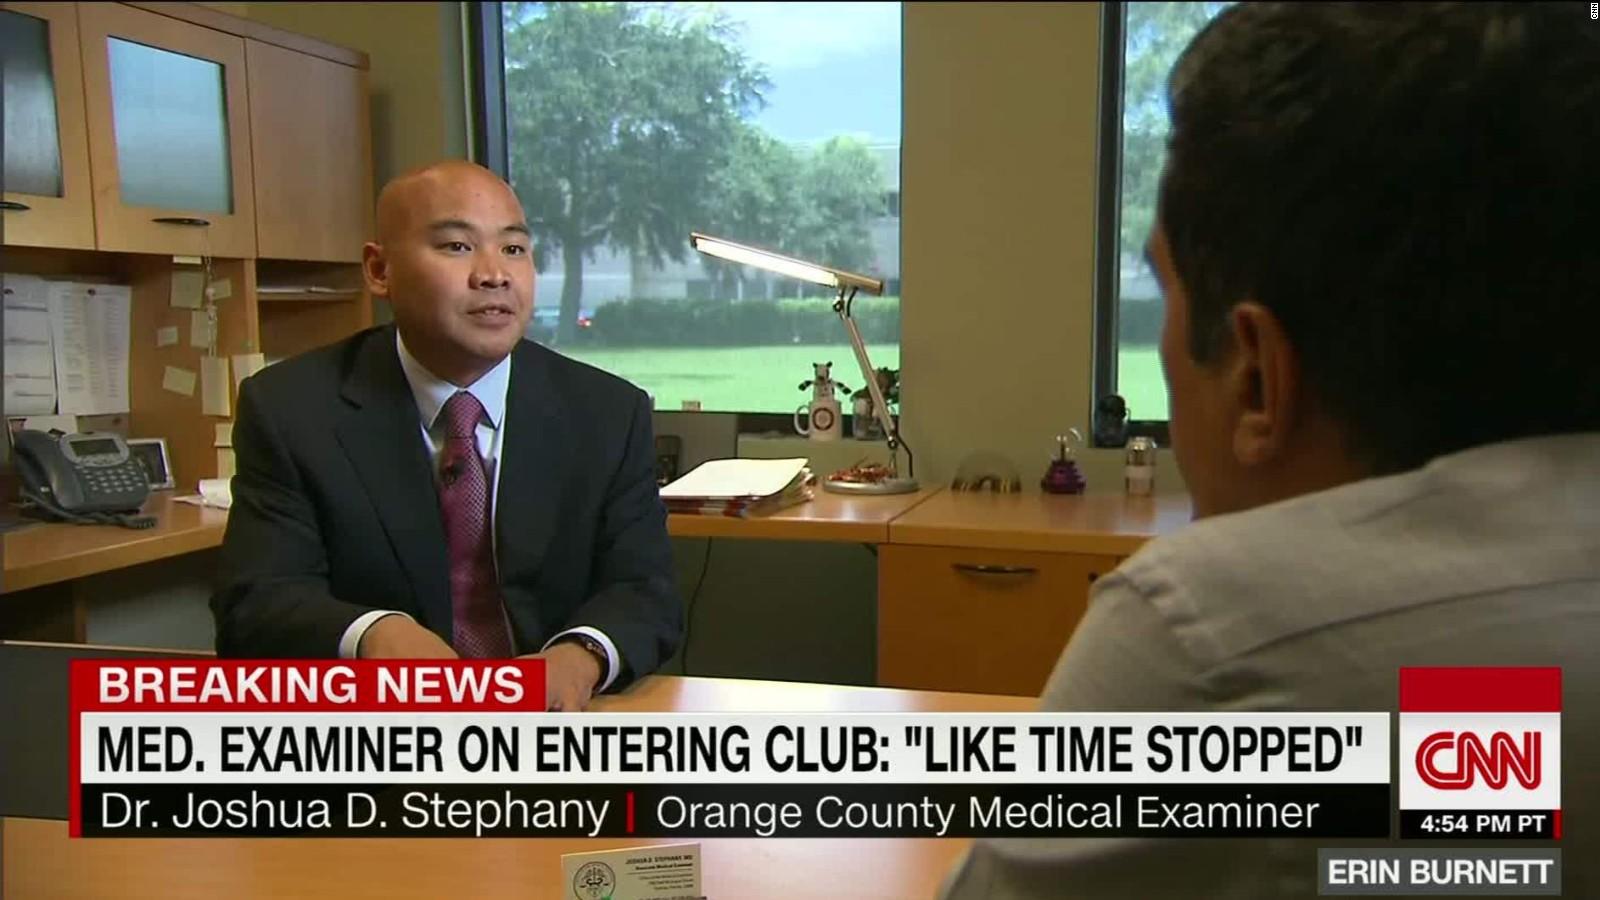 Medical examiner describes Orlando club after shooting - CNN Video